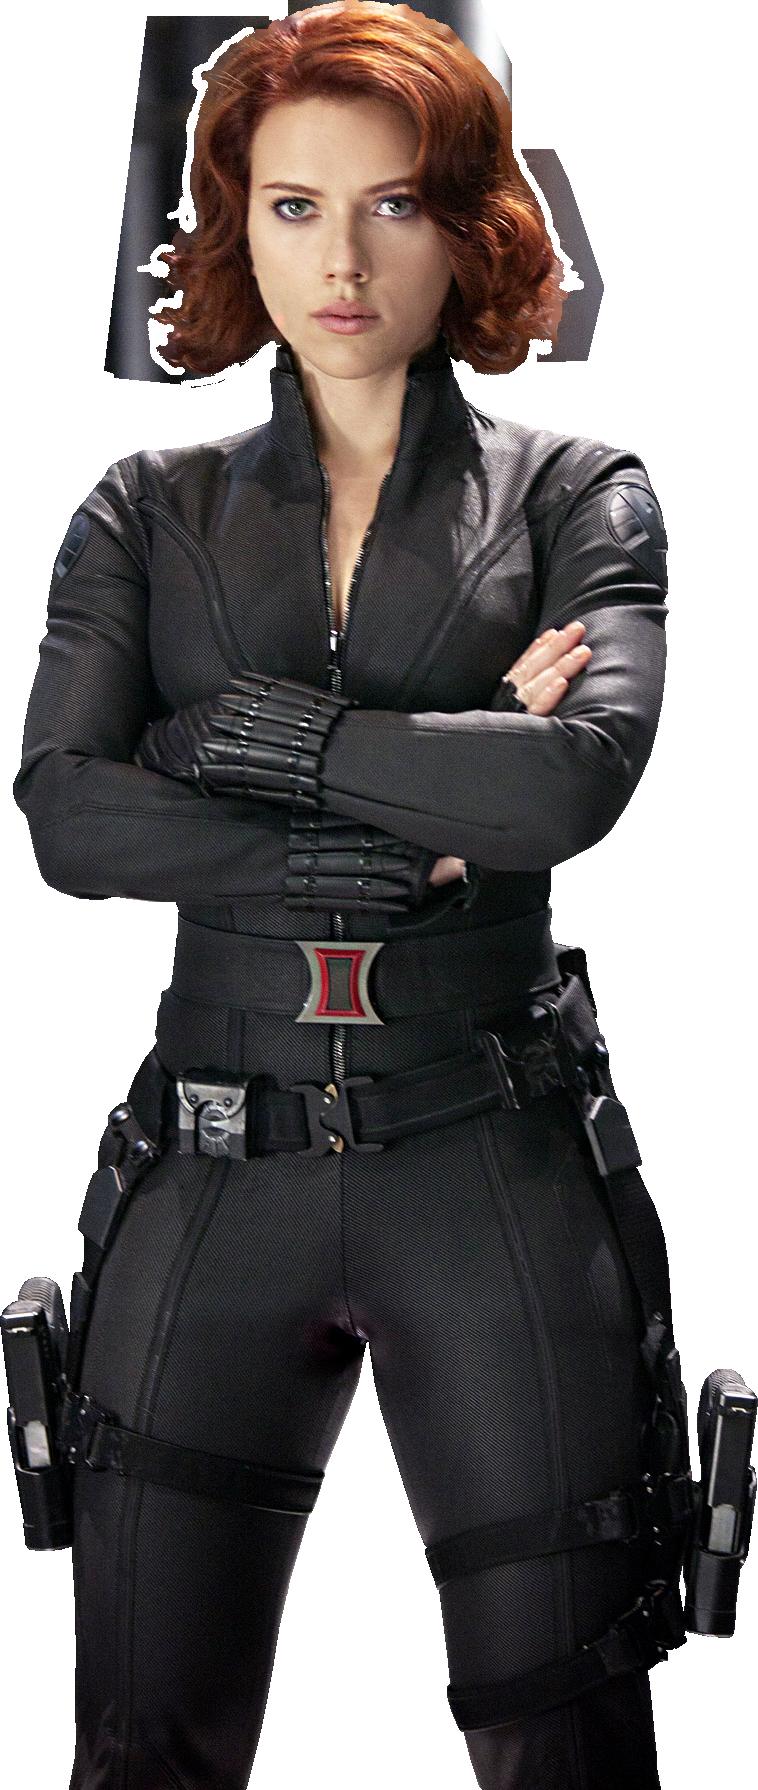 black widow costume plans pinterest black black. Black Bedroom Furniture Sets. Home Design Ideas